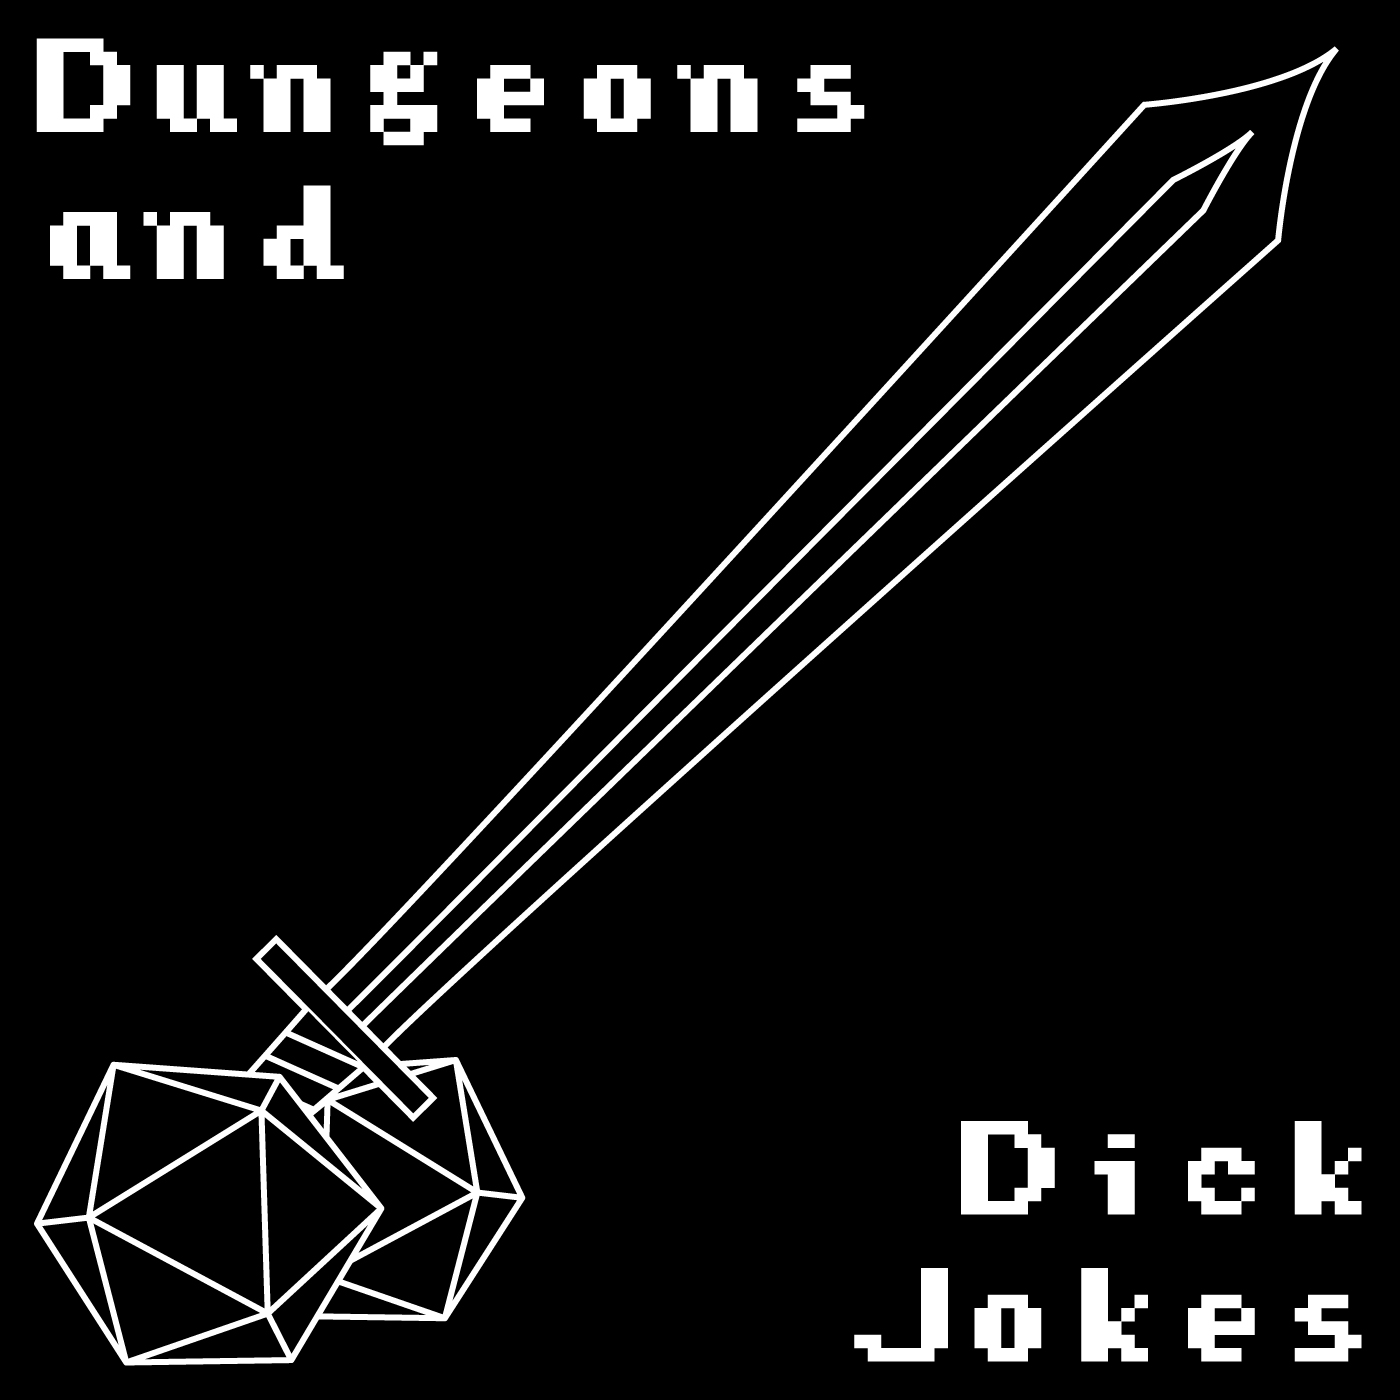 DNDJ - Dungeons and Dick Jokes